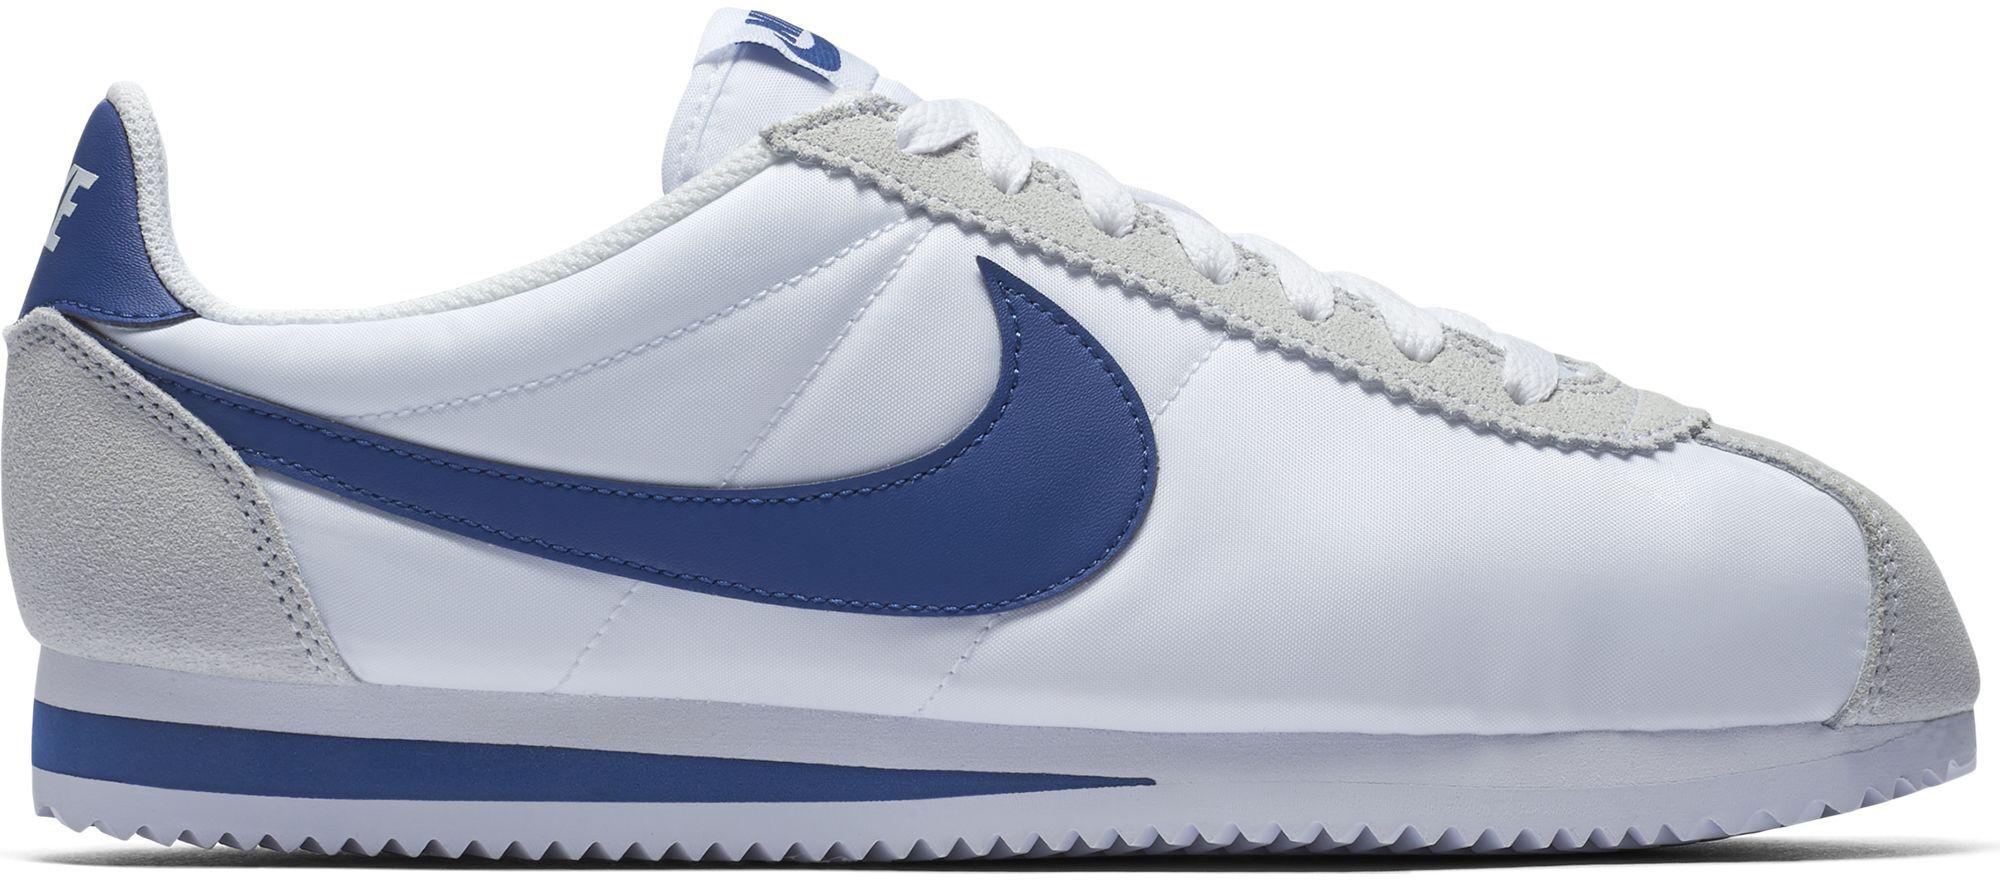 Nike Classic Cortez Nylon hombre en Blanco